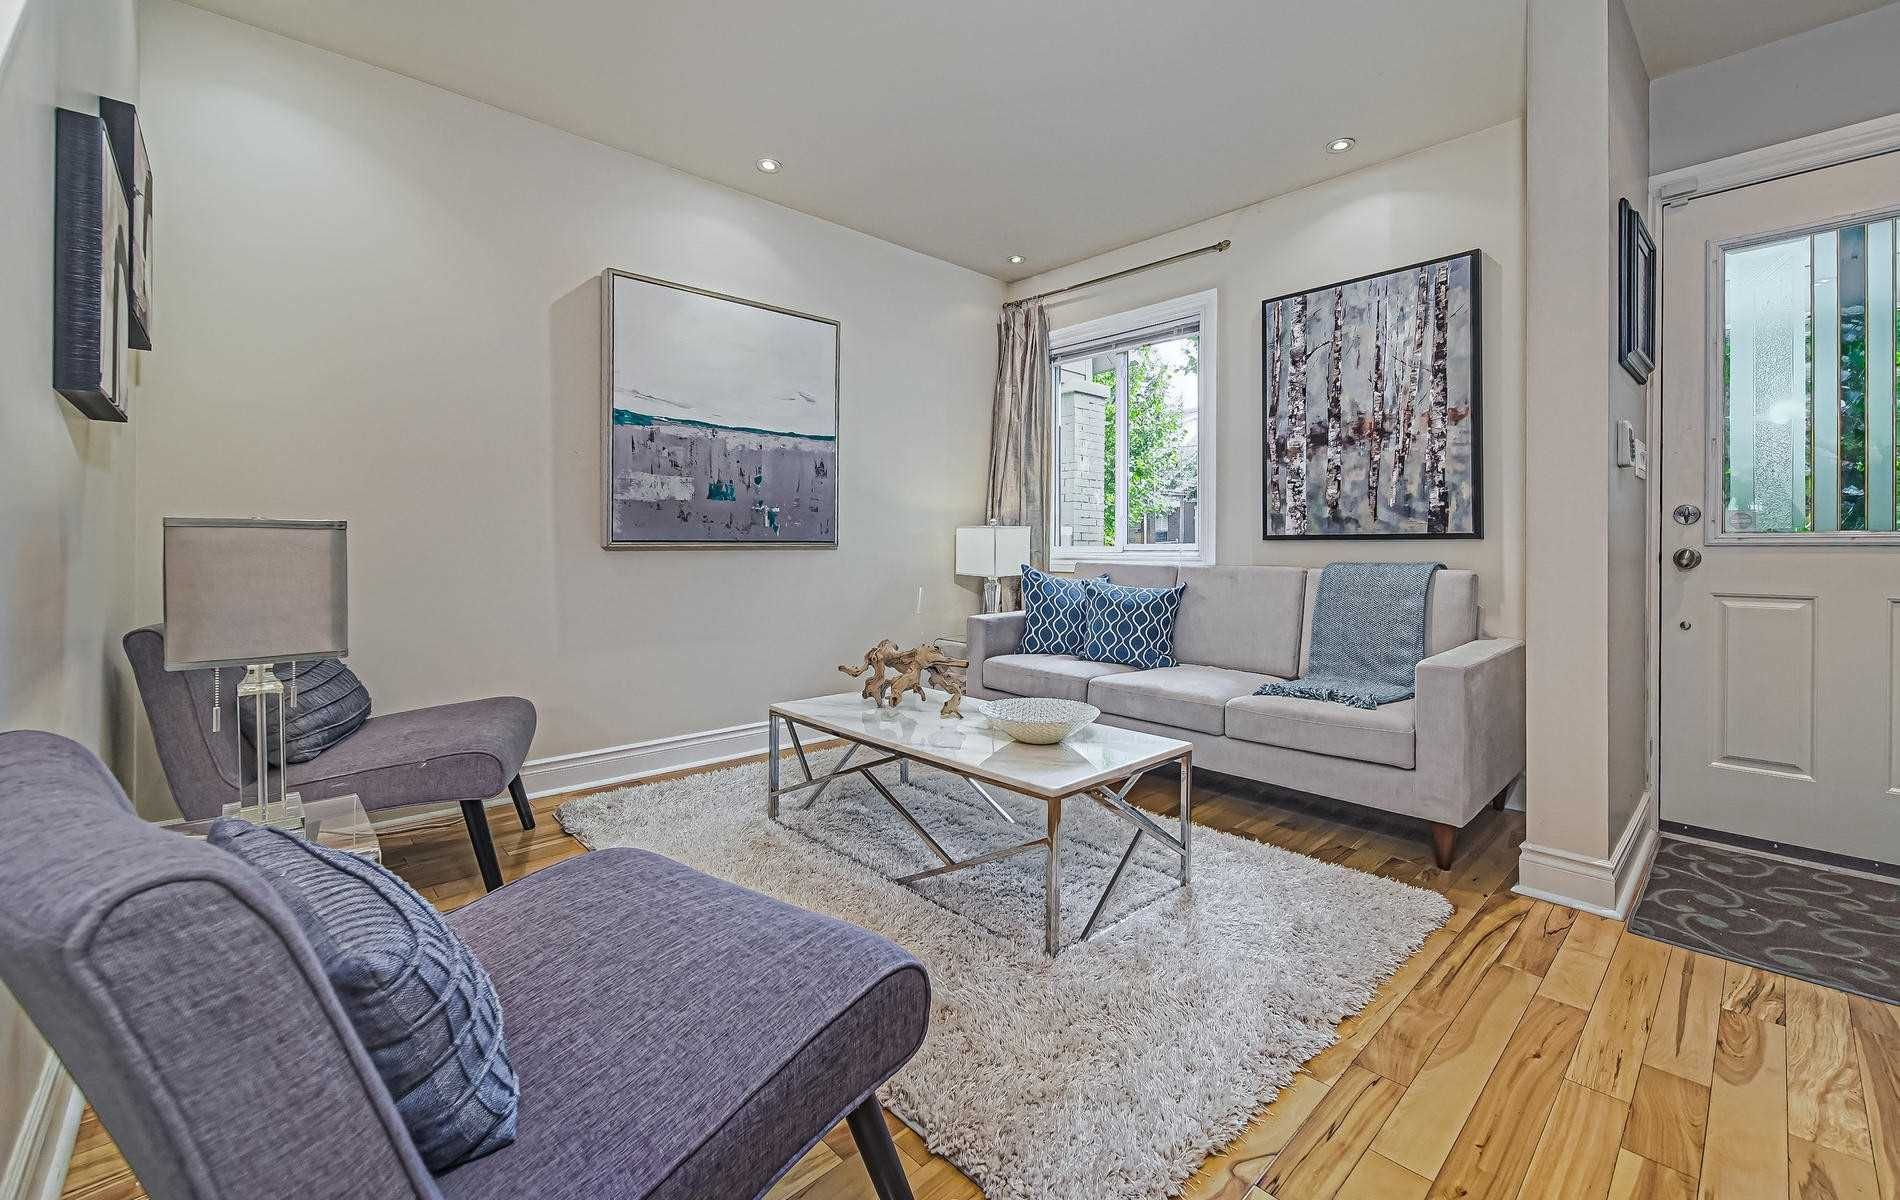 Main Photo: 84 Rushbrooke Avenue in Toronto: South Riverdale House (2-Storey) for sale (Toronto E01)  : MLS®# E4600791